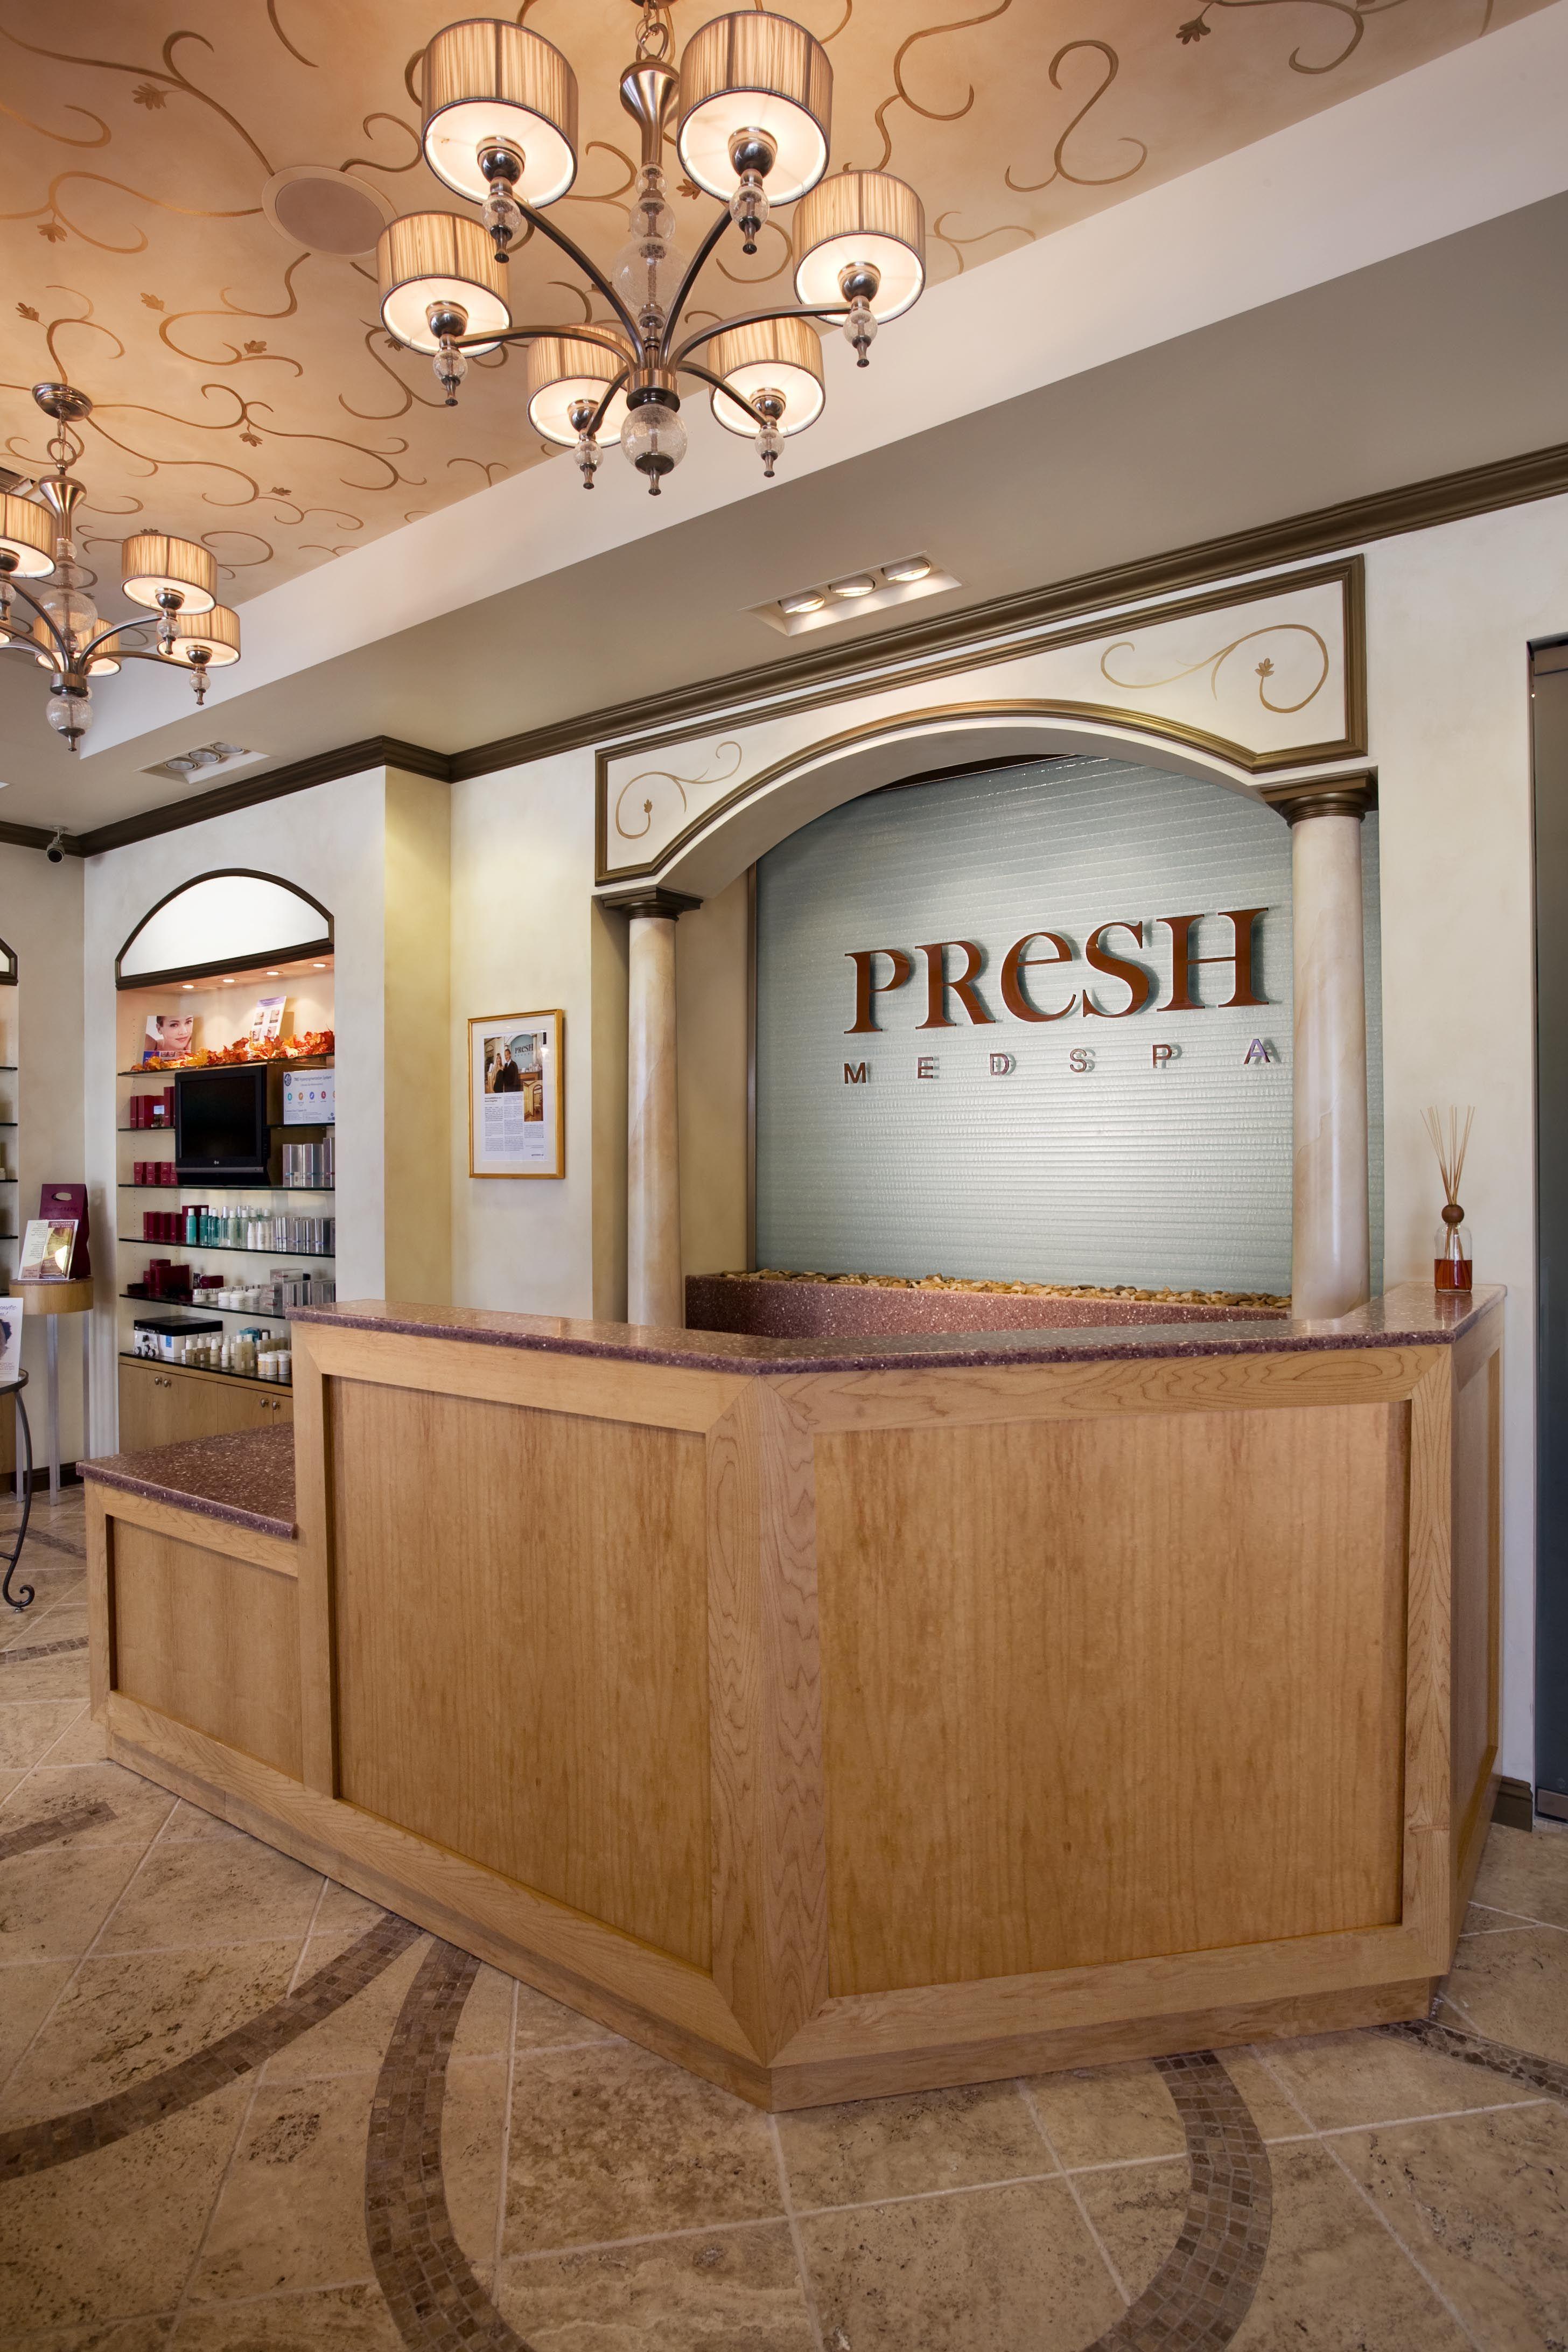 Presh Medical Spa Reception Retail Interior Design by Michele